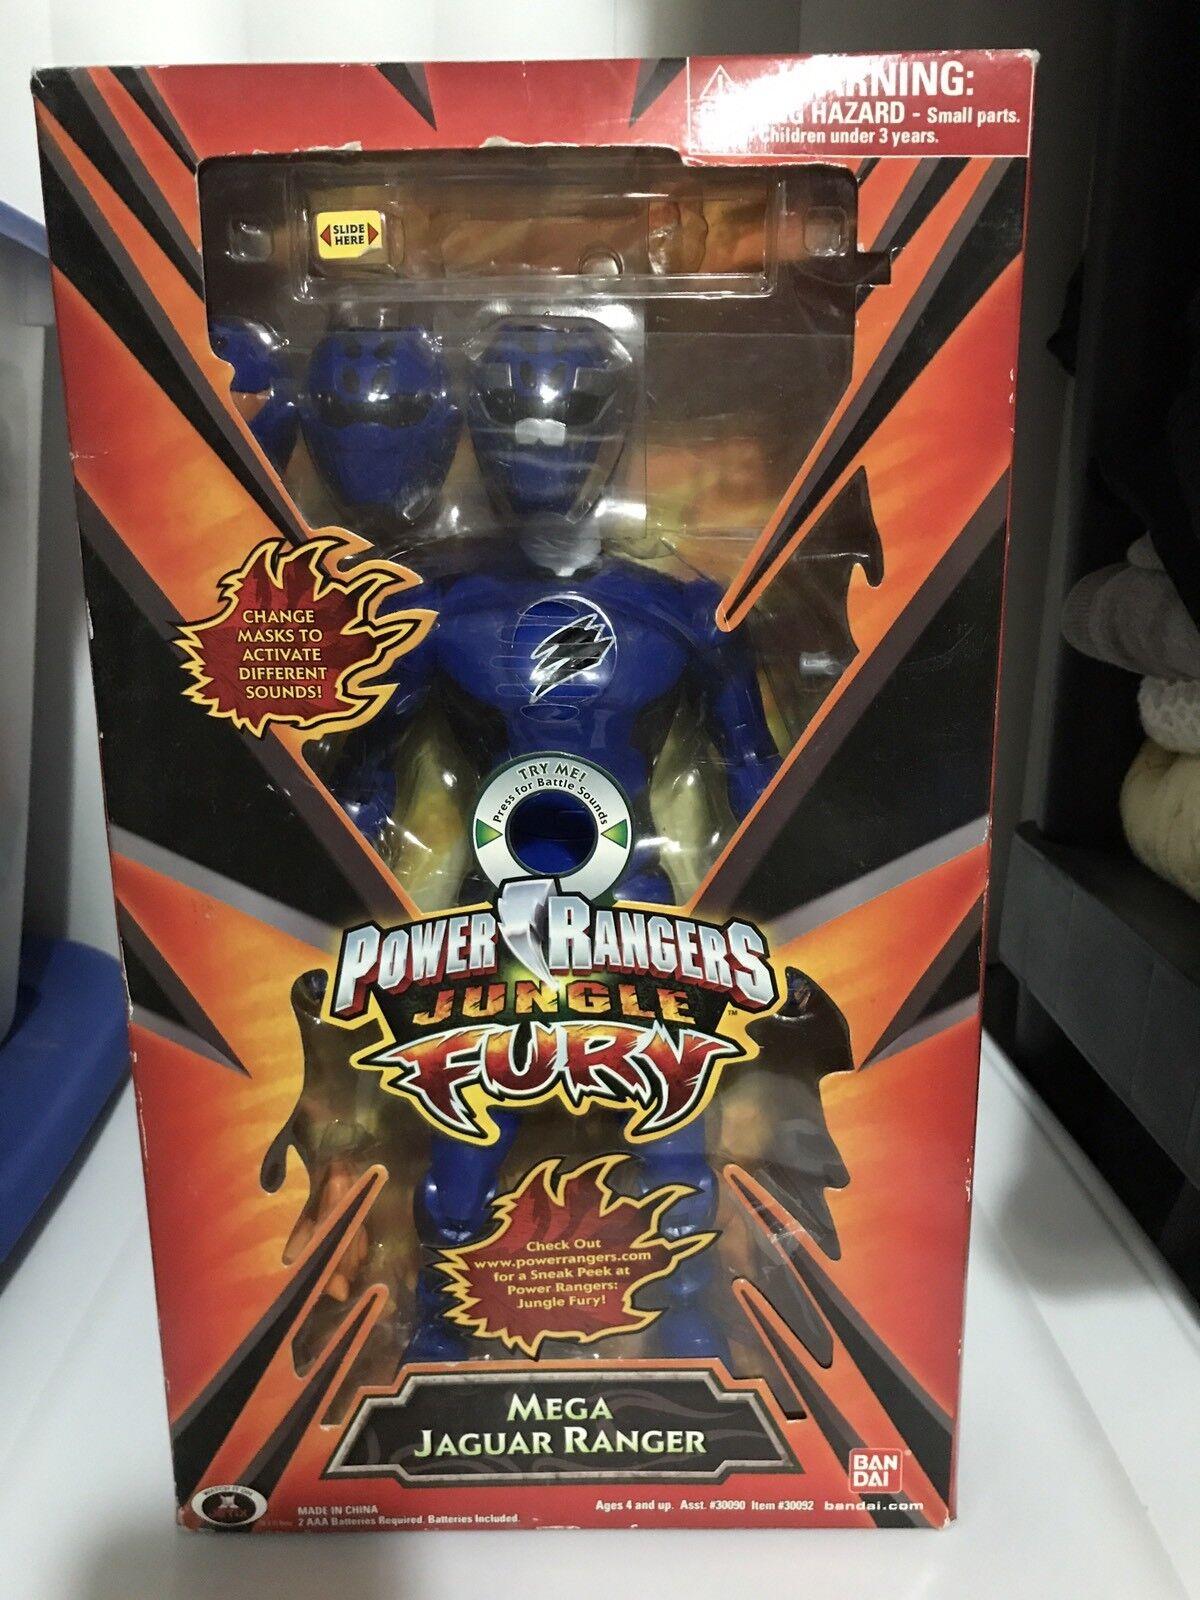 Power Power Power Rangers Jungle Fury _  12  _  Mega bluee Jaguar Ranger Action Figure   Doll 2ec77f